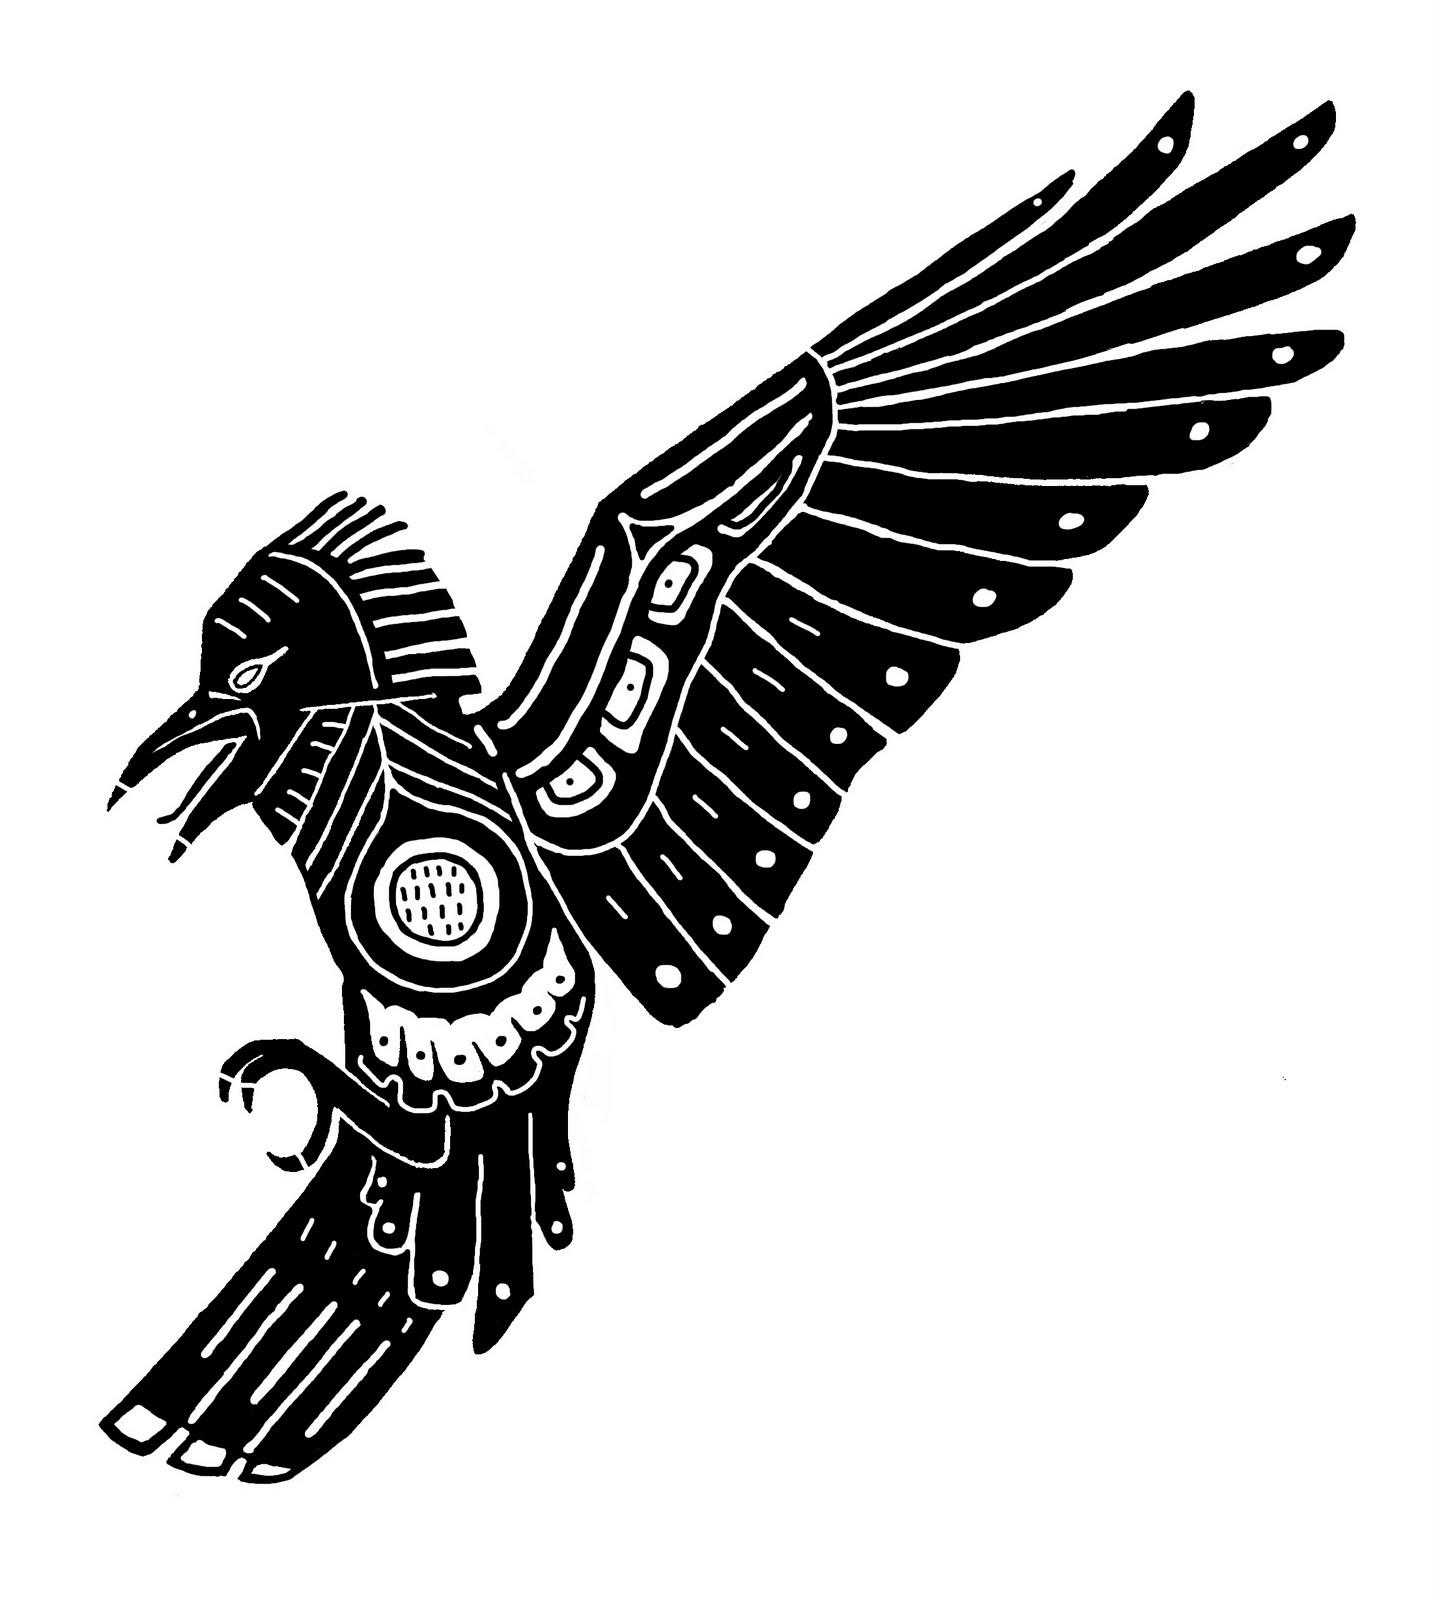 Celtic Raven Tattoo Designs Celtic Raven Tattoos